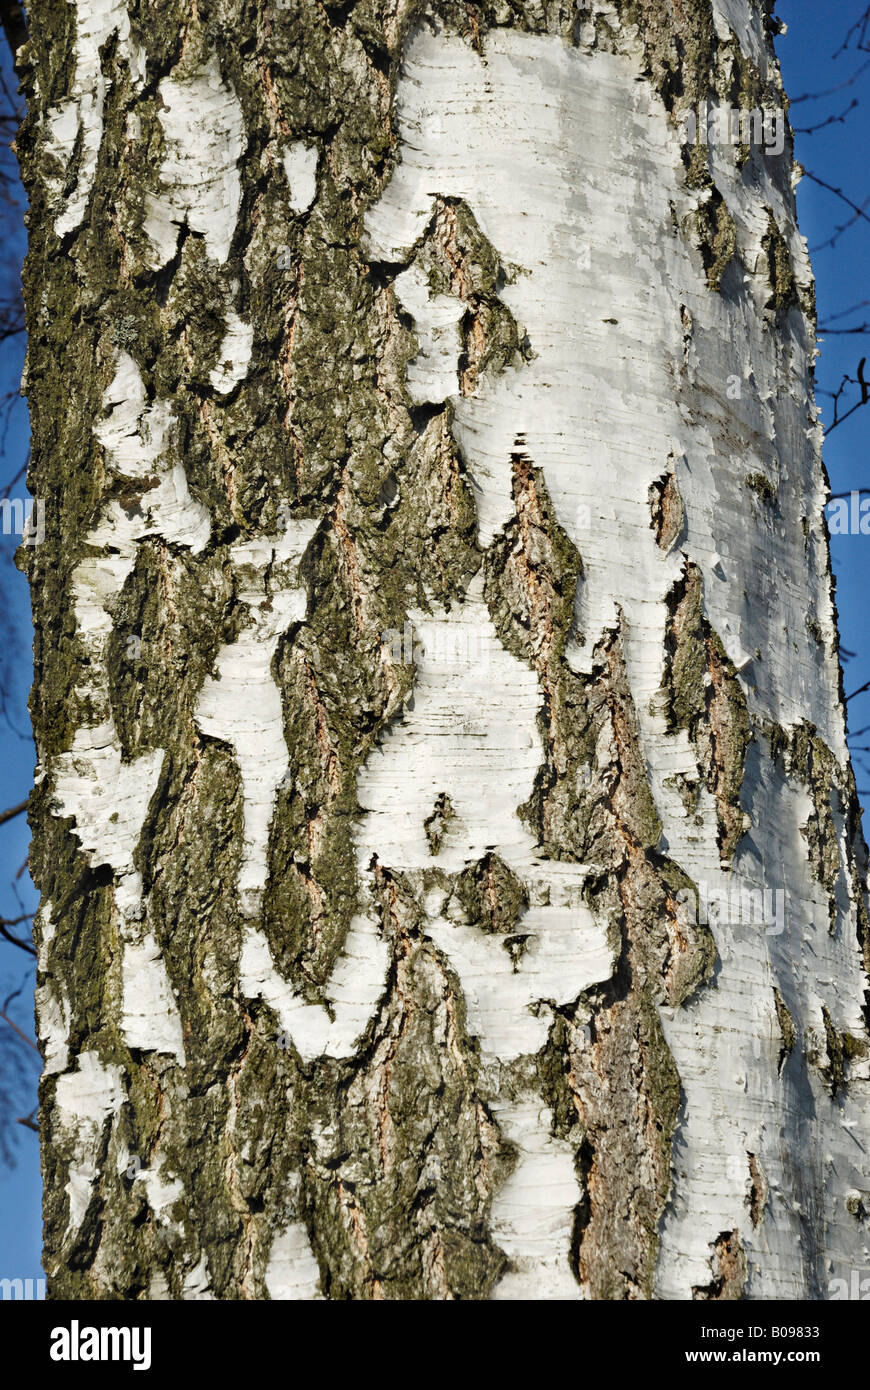 Cracked White Birch bark (Betula pubescens) Stock Photo